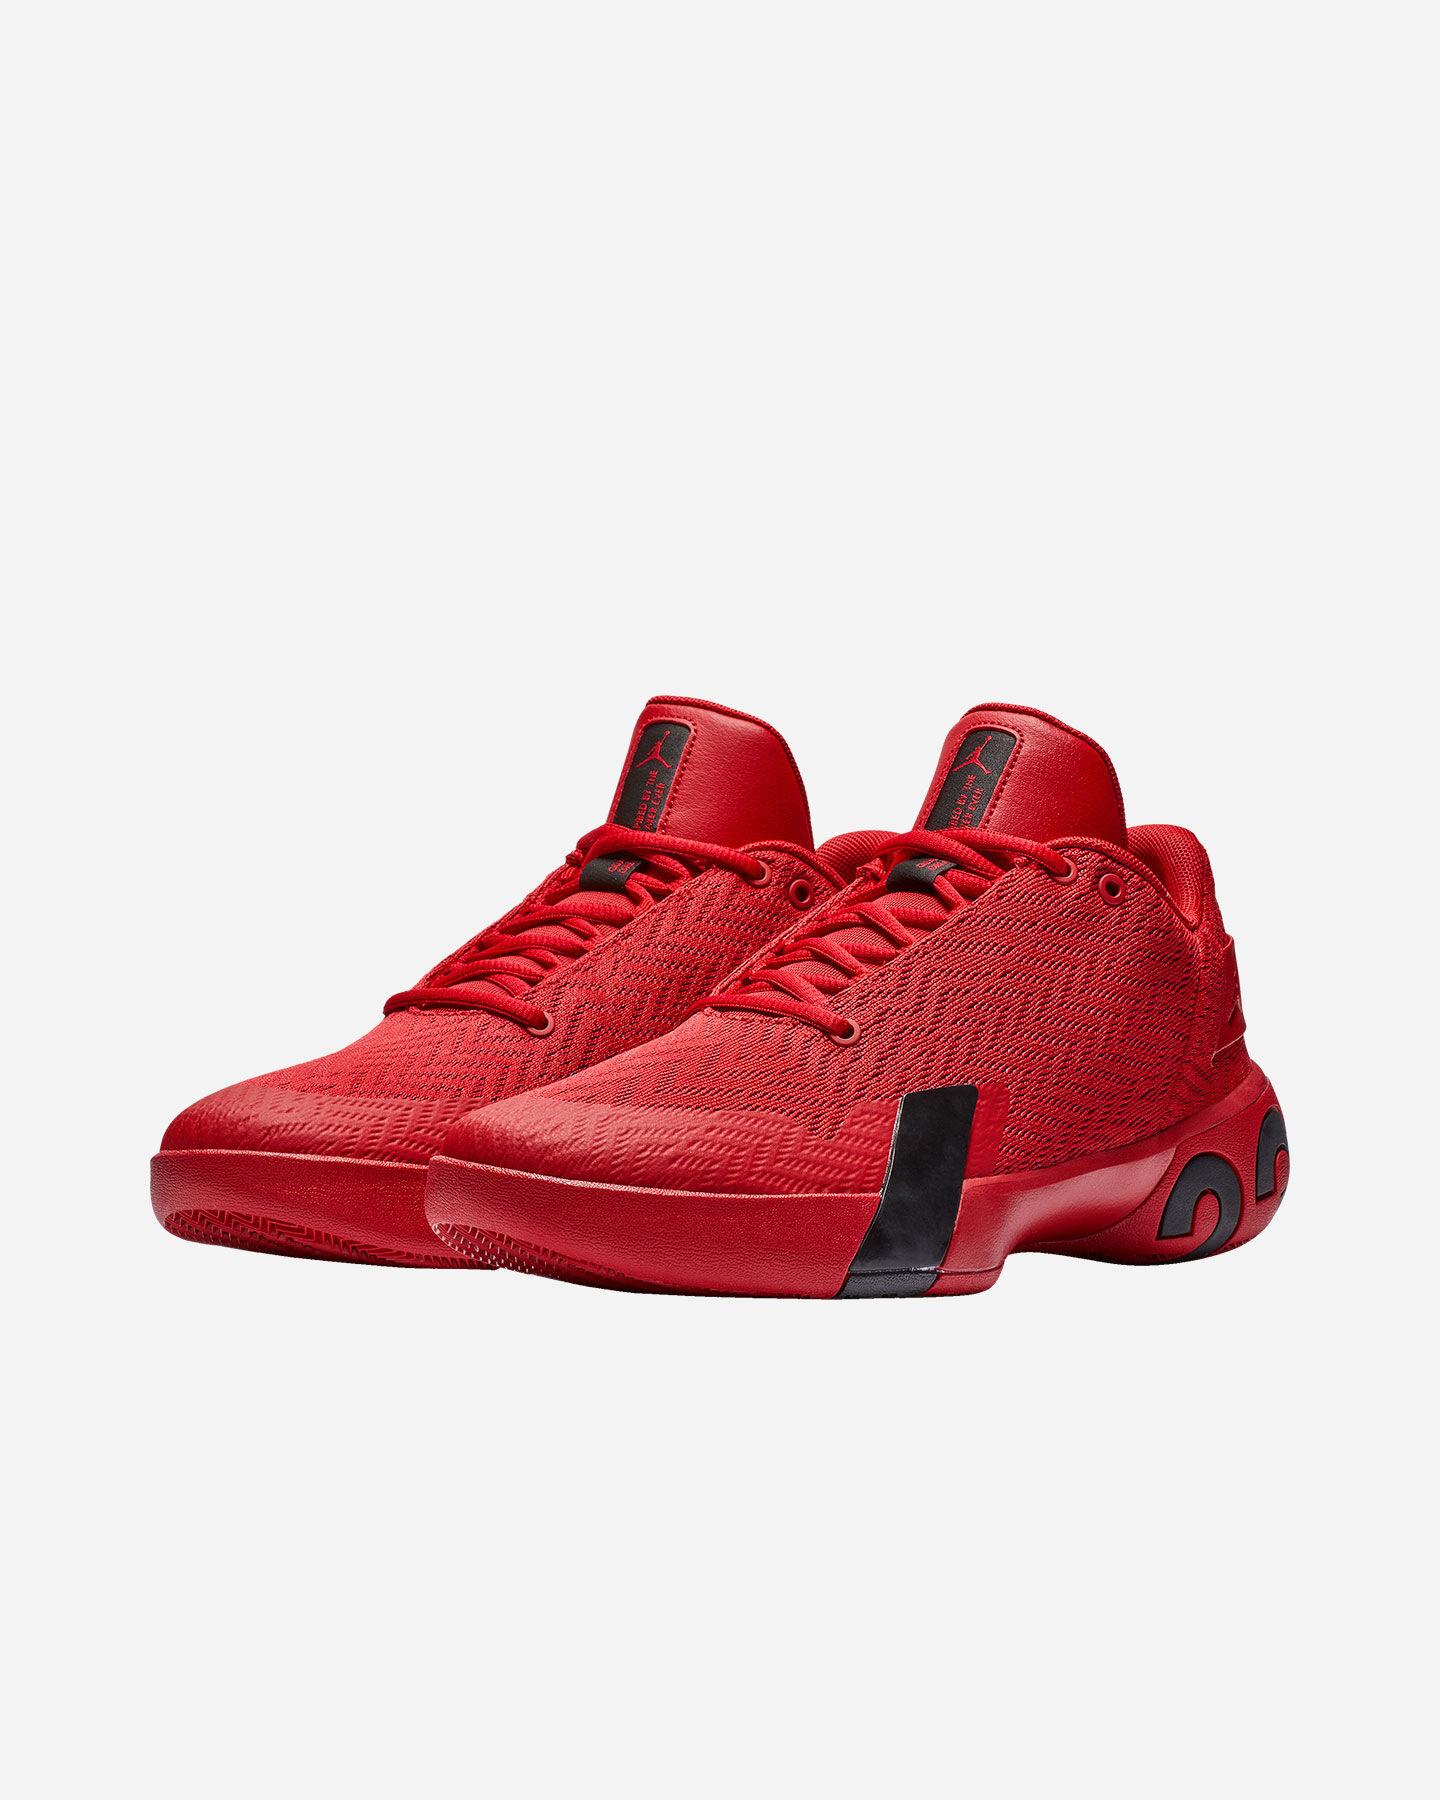 e6b731fc19 M Ao6224 Su Jordan Scarpe Nike 3 Fly Cisalfa 600 Basket Low Ultra qBwpf